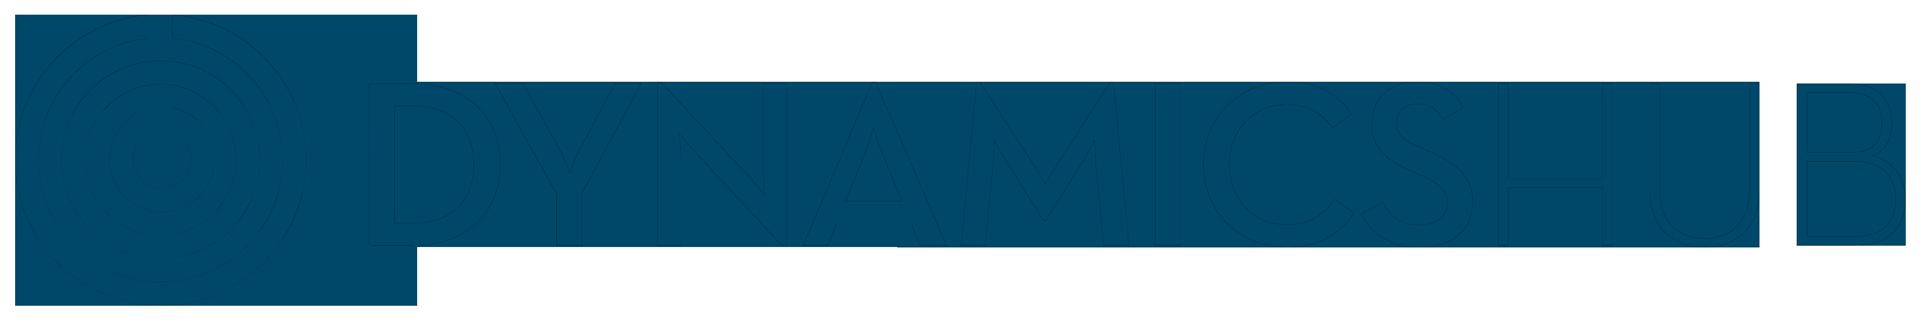 Dynamics HUB referentie - Spant congrescentrum